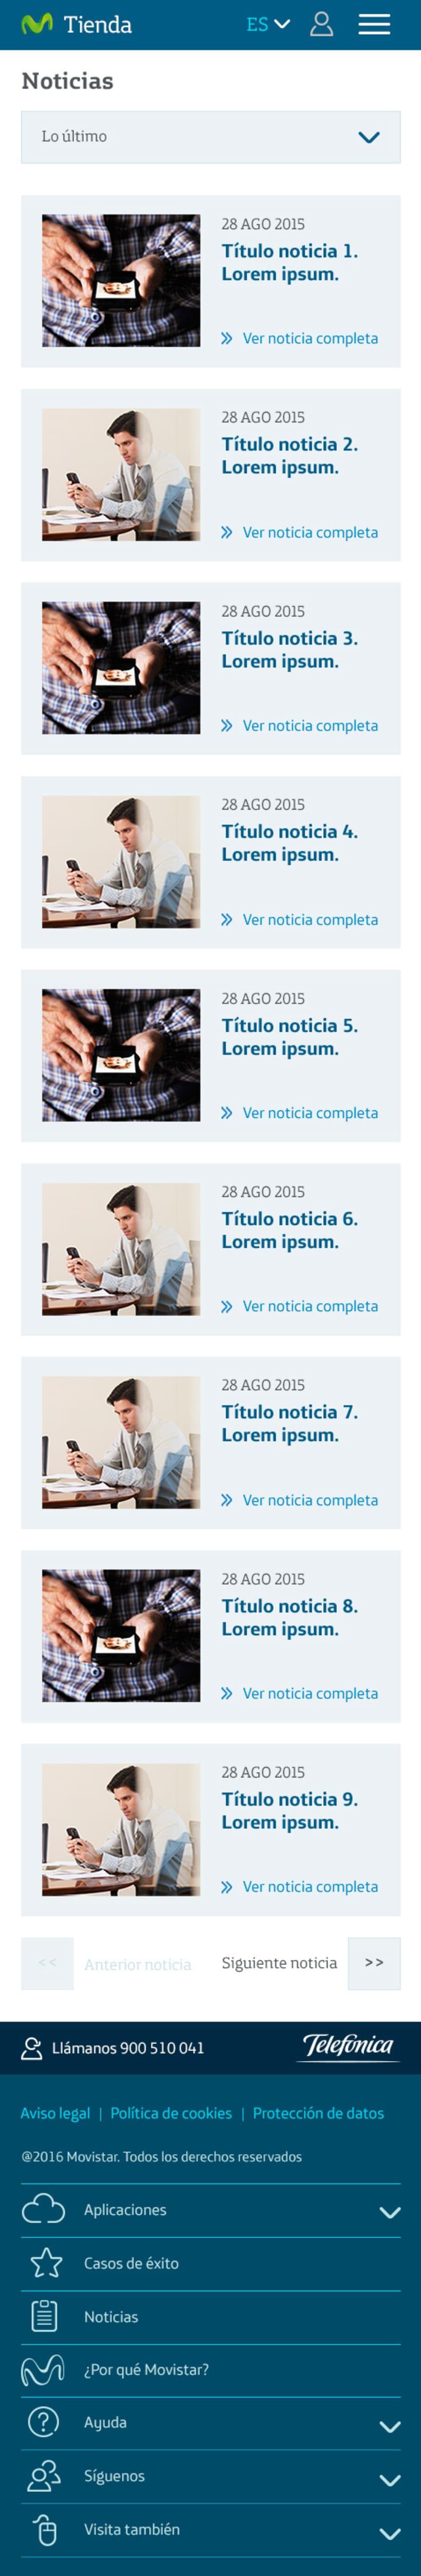 Marketplace servicios cloud 26